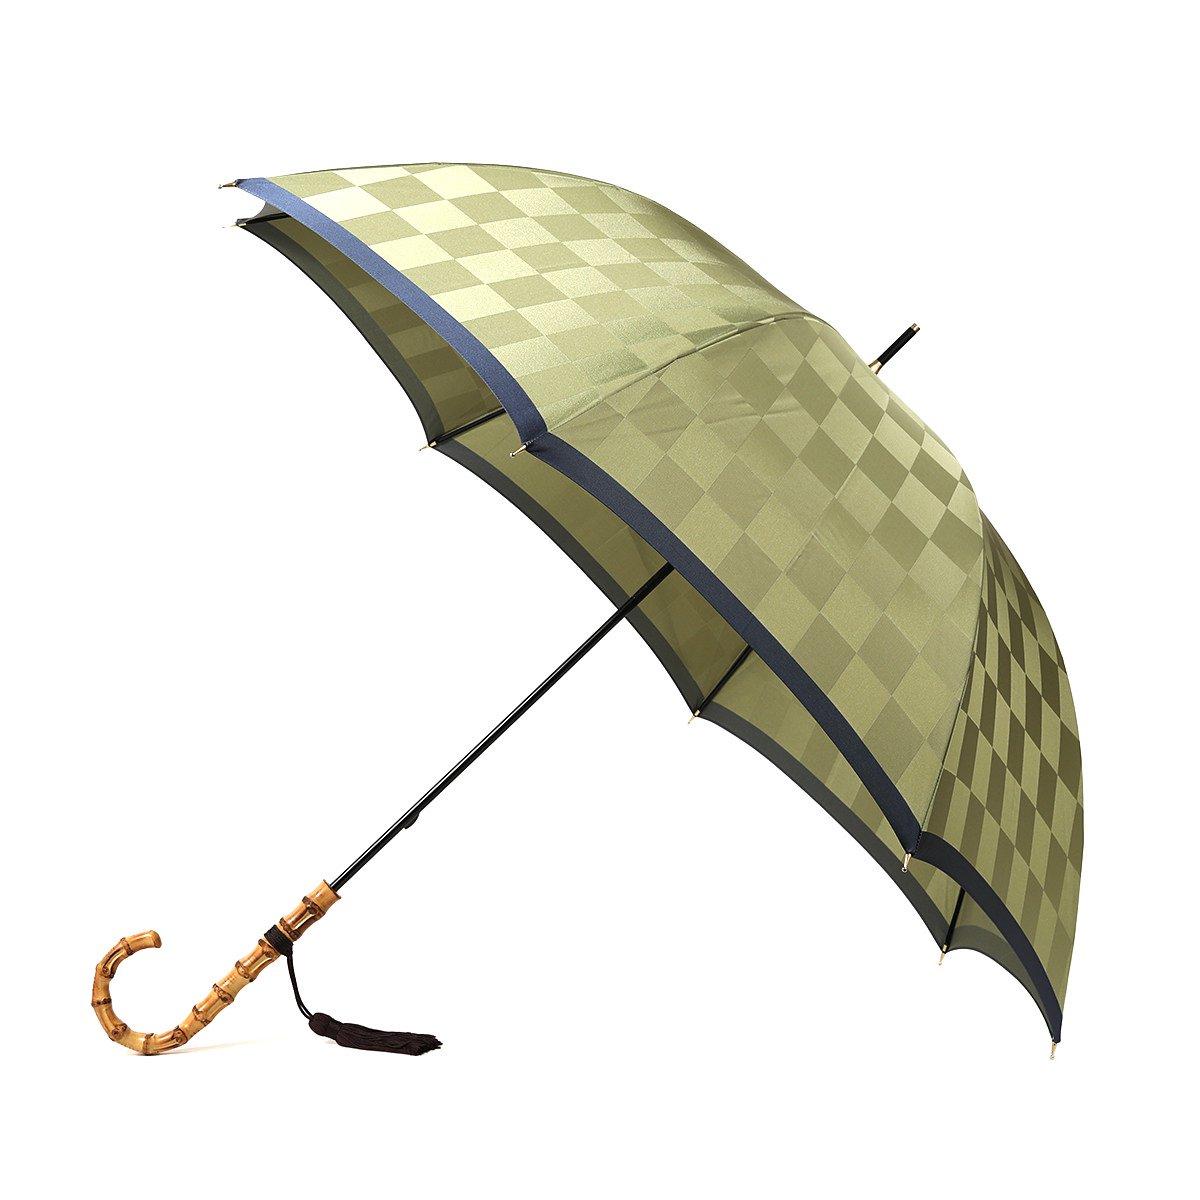 レディース 市松柄 細巻 長傘 詳細画像5